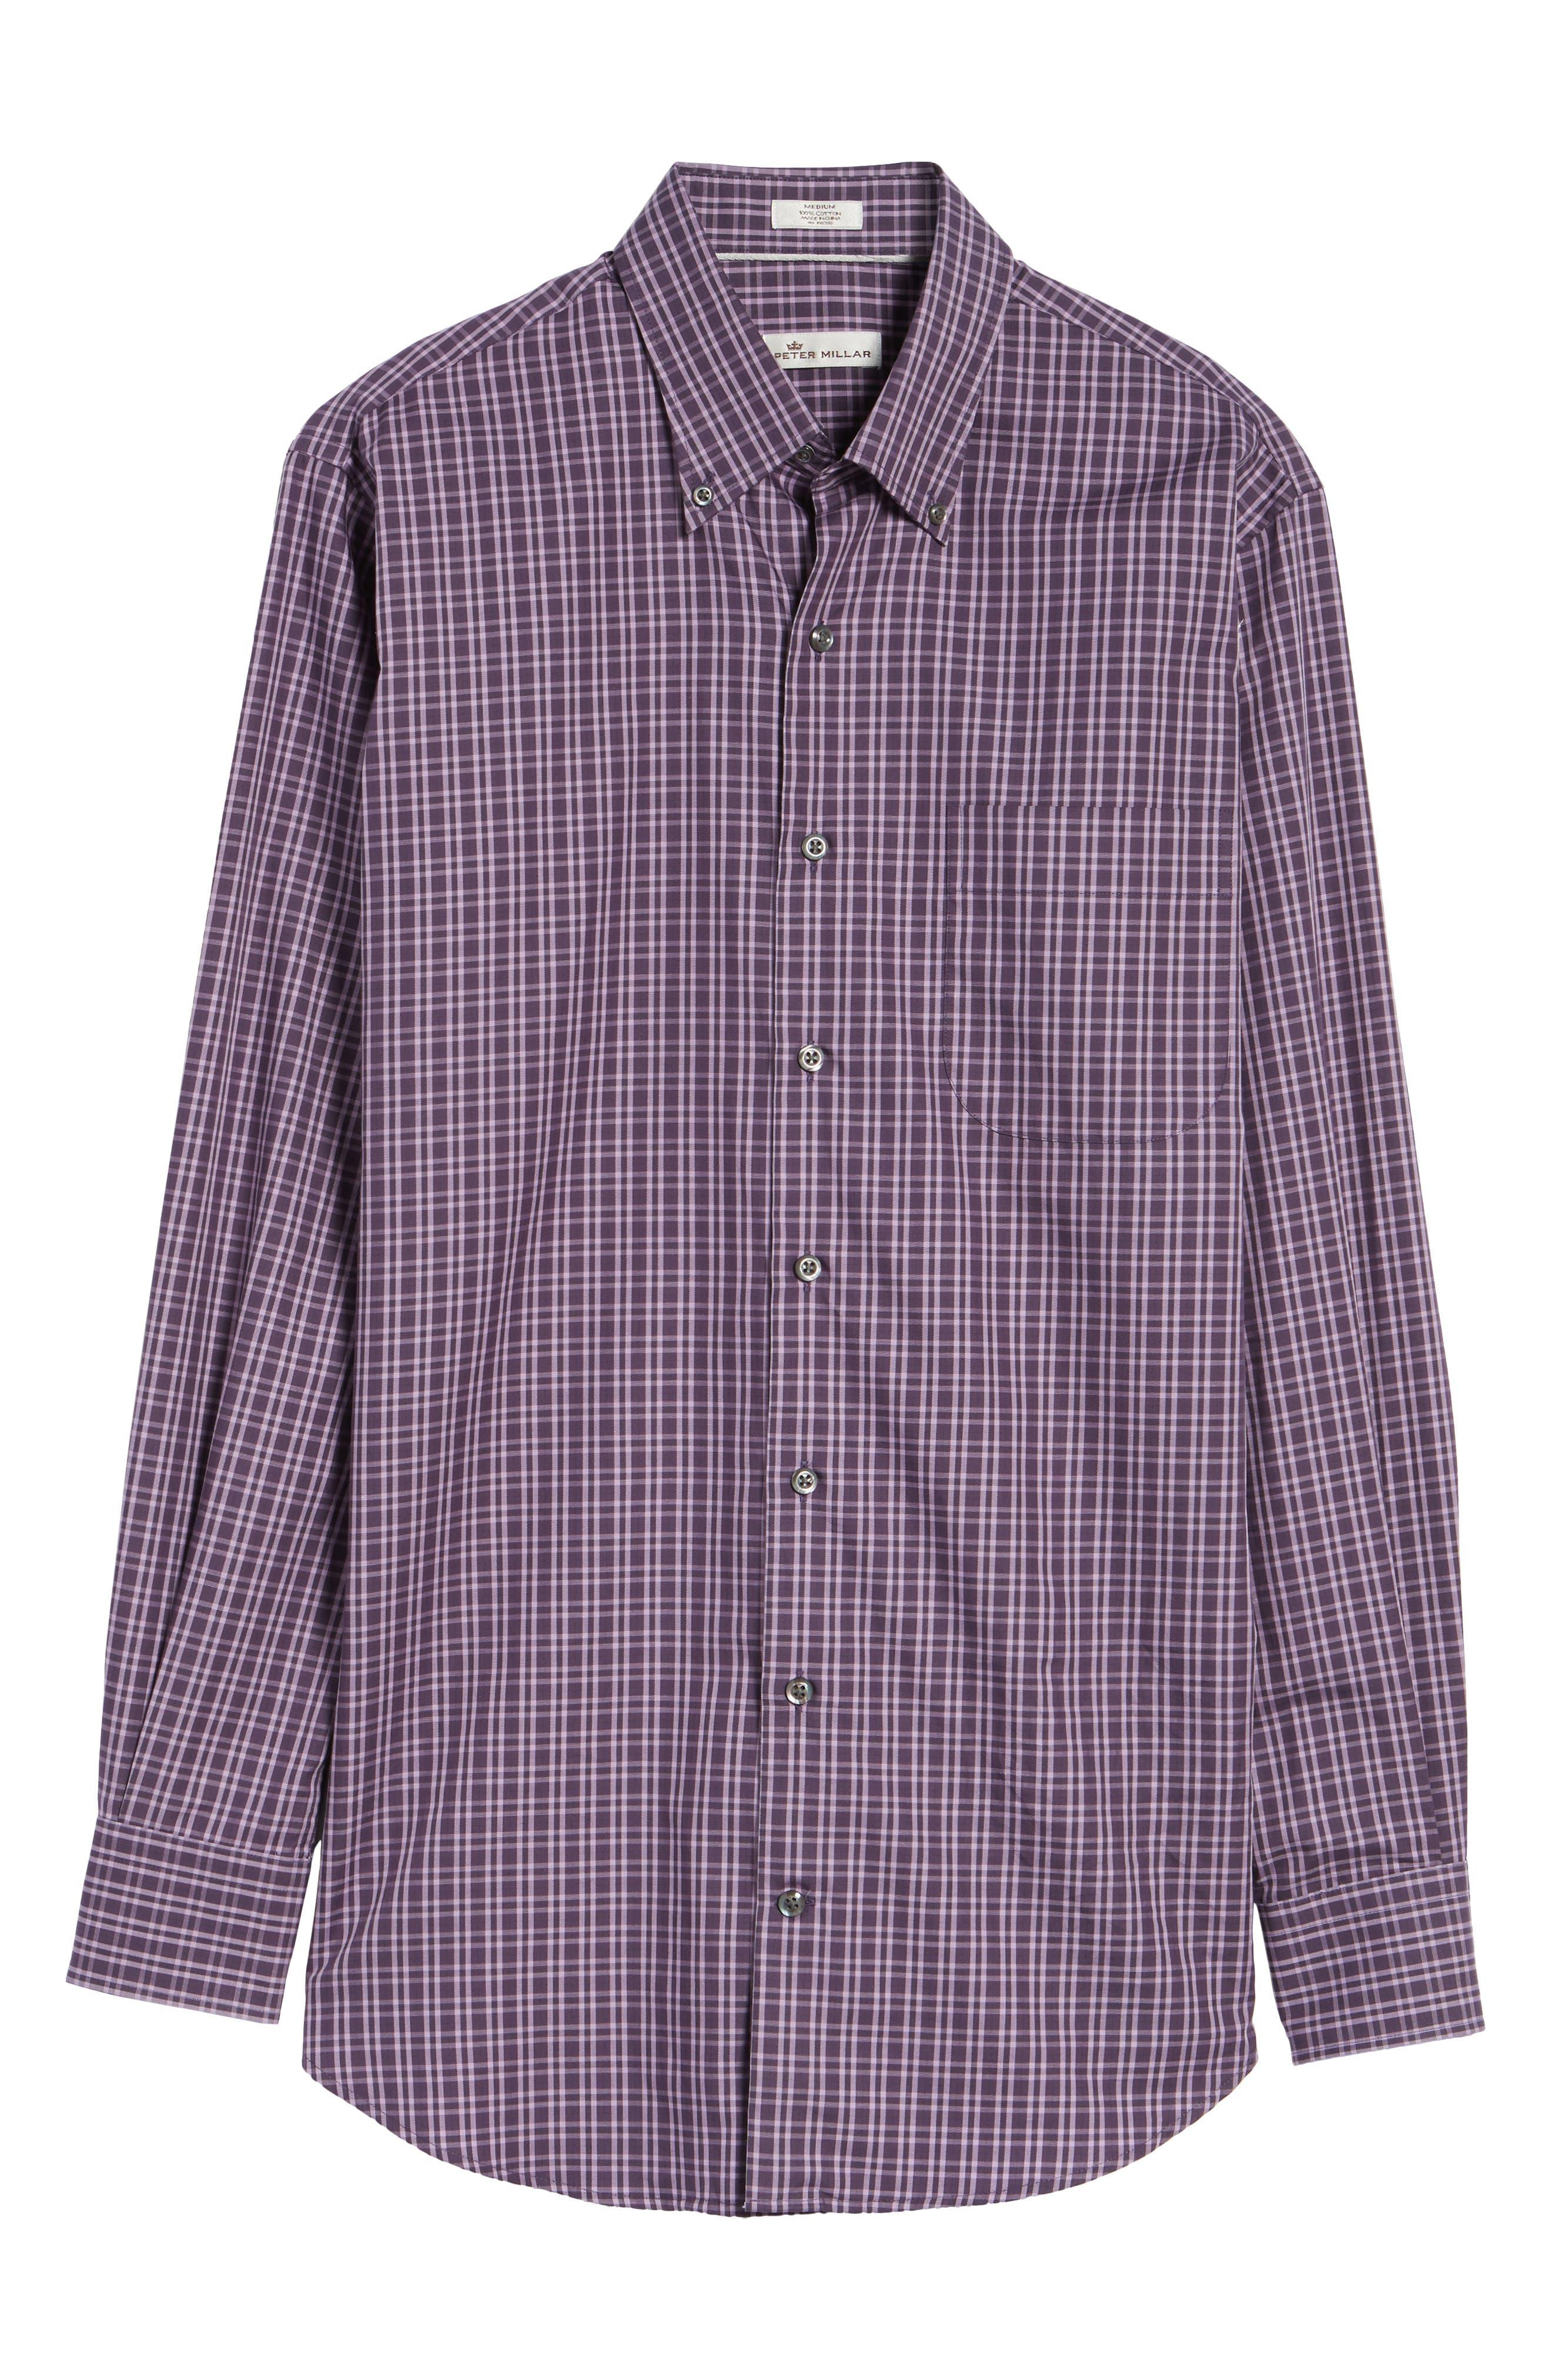 Autumn Check Regular Fit Sport Shirt,                             Alternate thumbnail 6, color,                             Blackberry